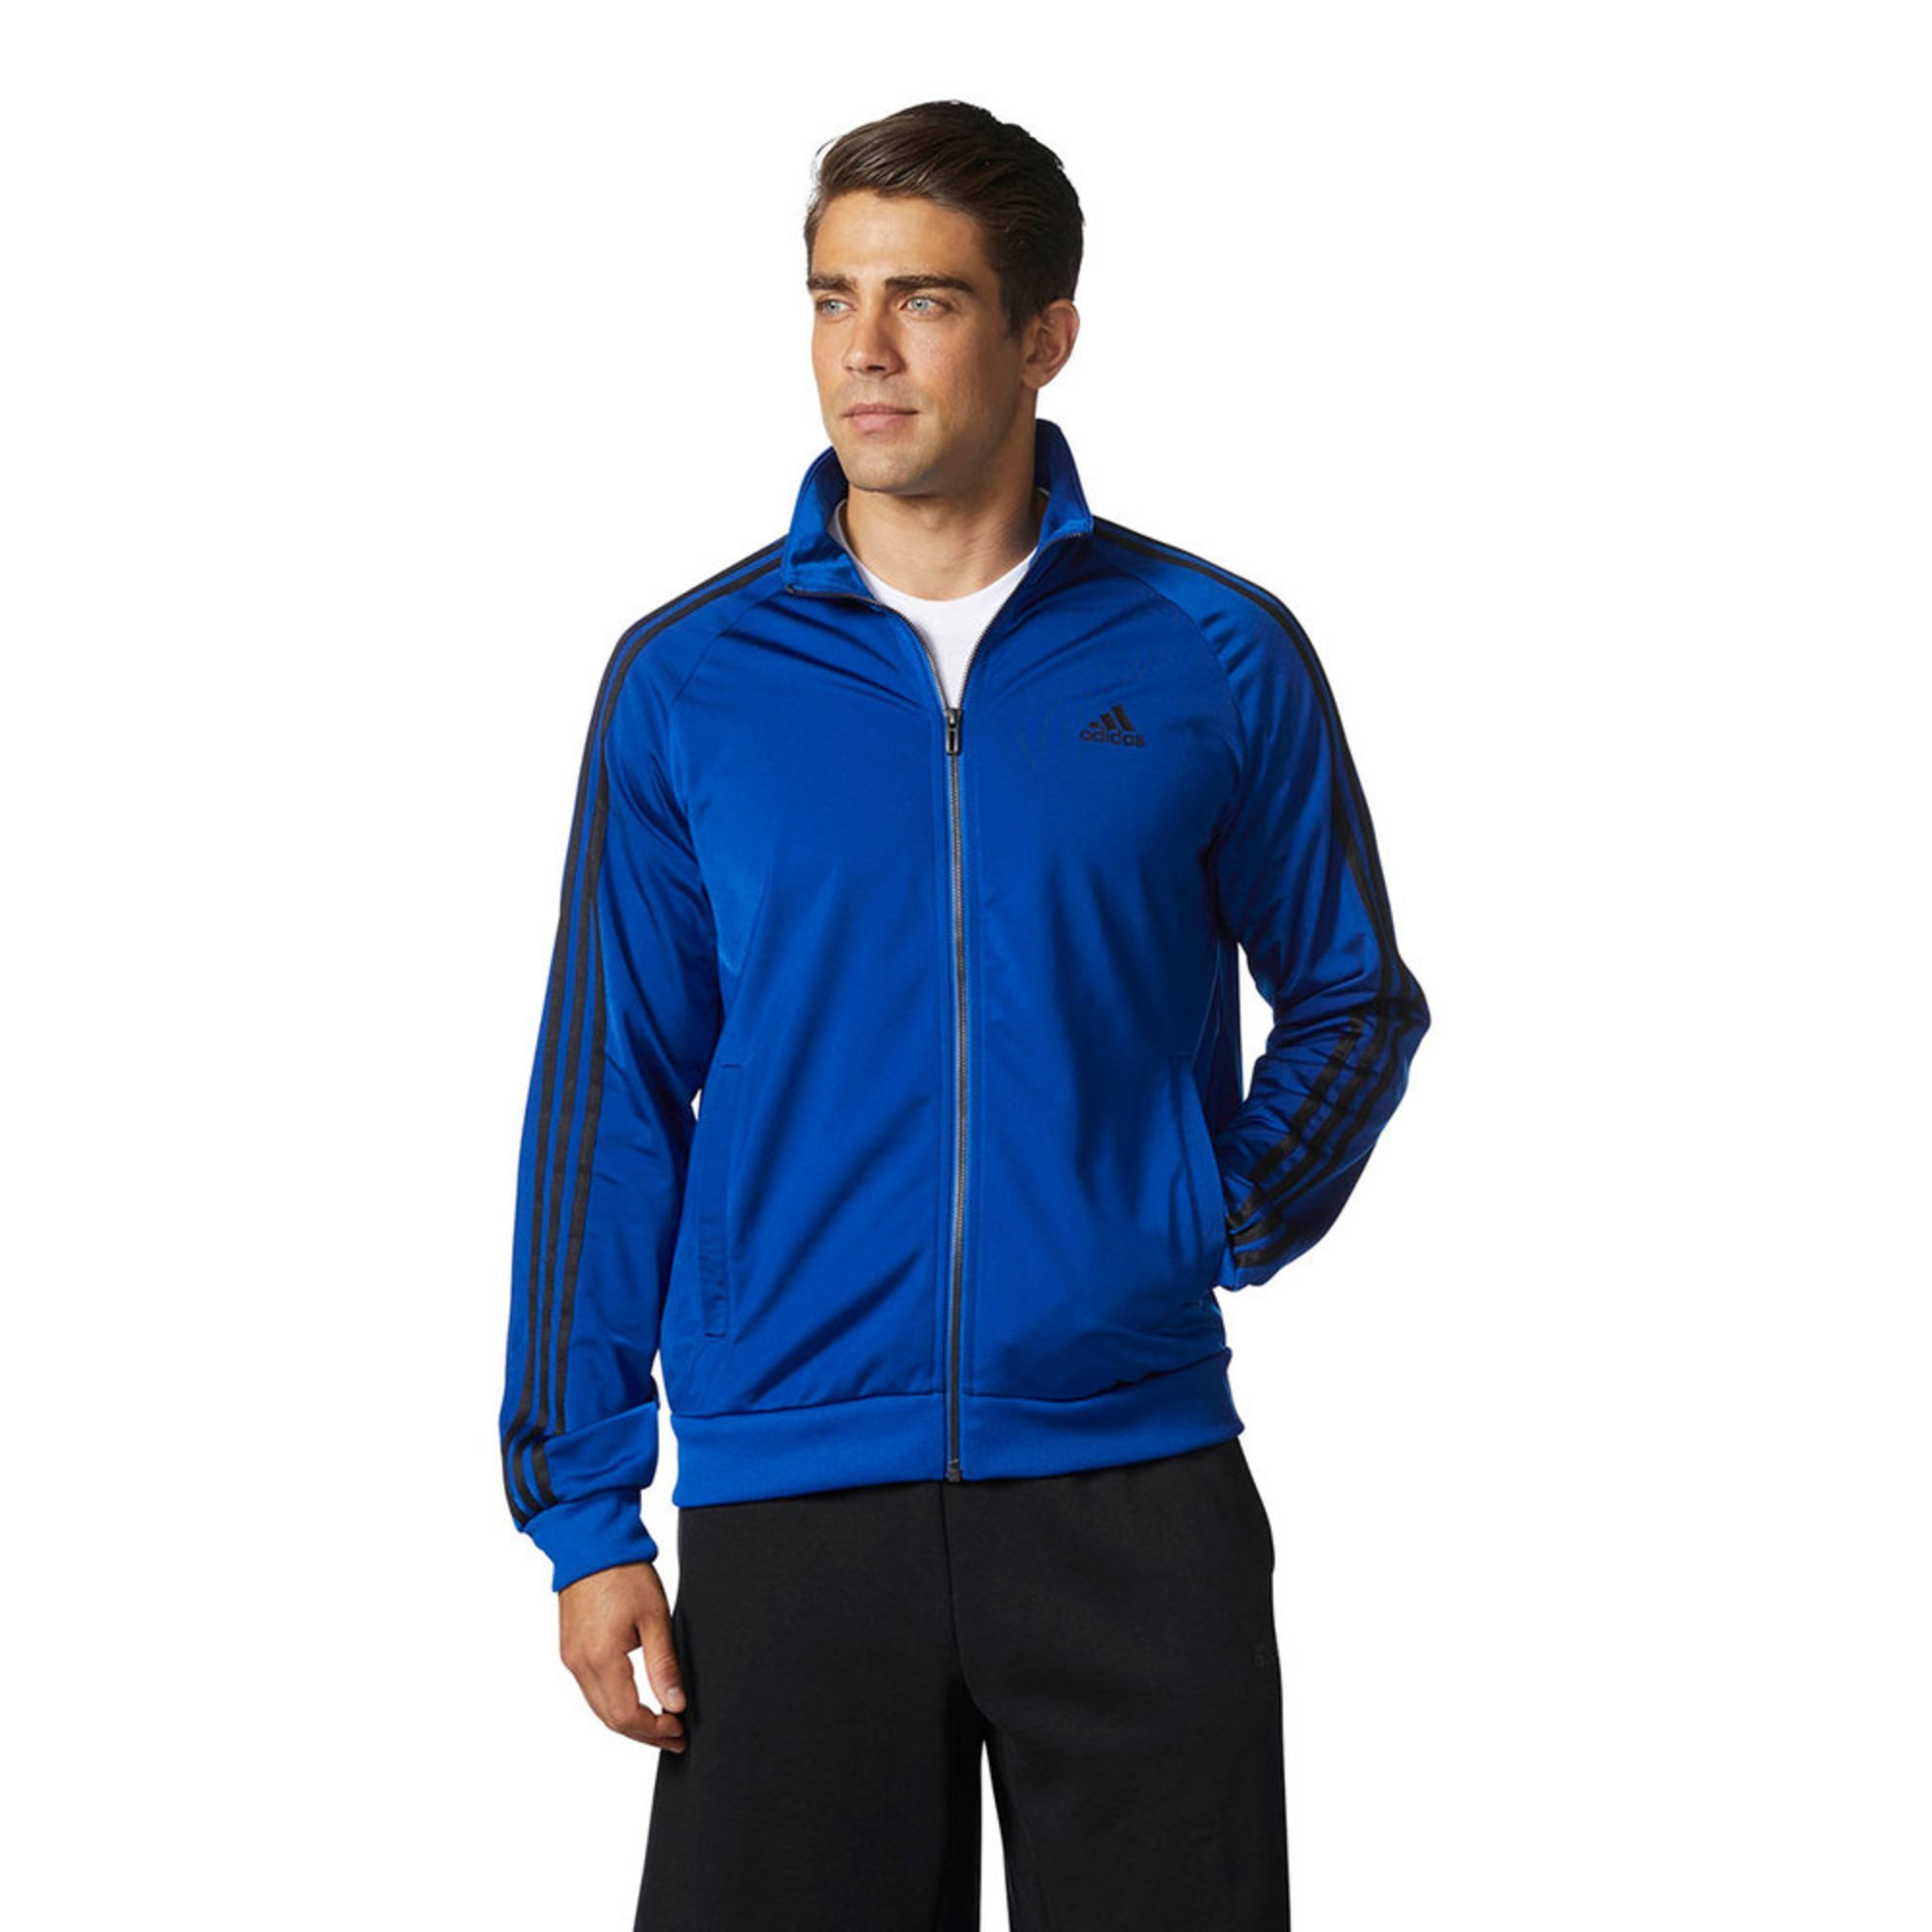 a906edee701f Adidas Men's Ess 3s Essentials Tricot Track Jacket | Active Jackets ...